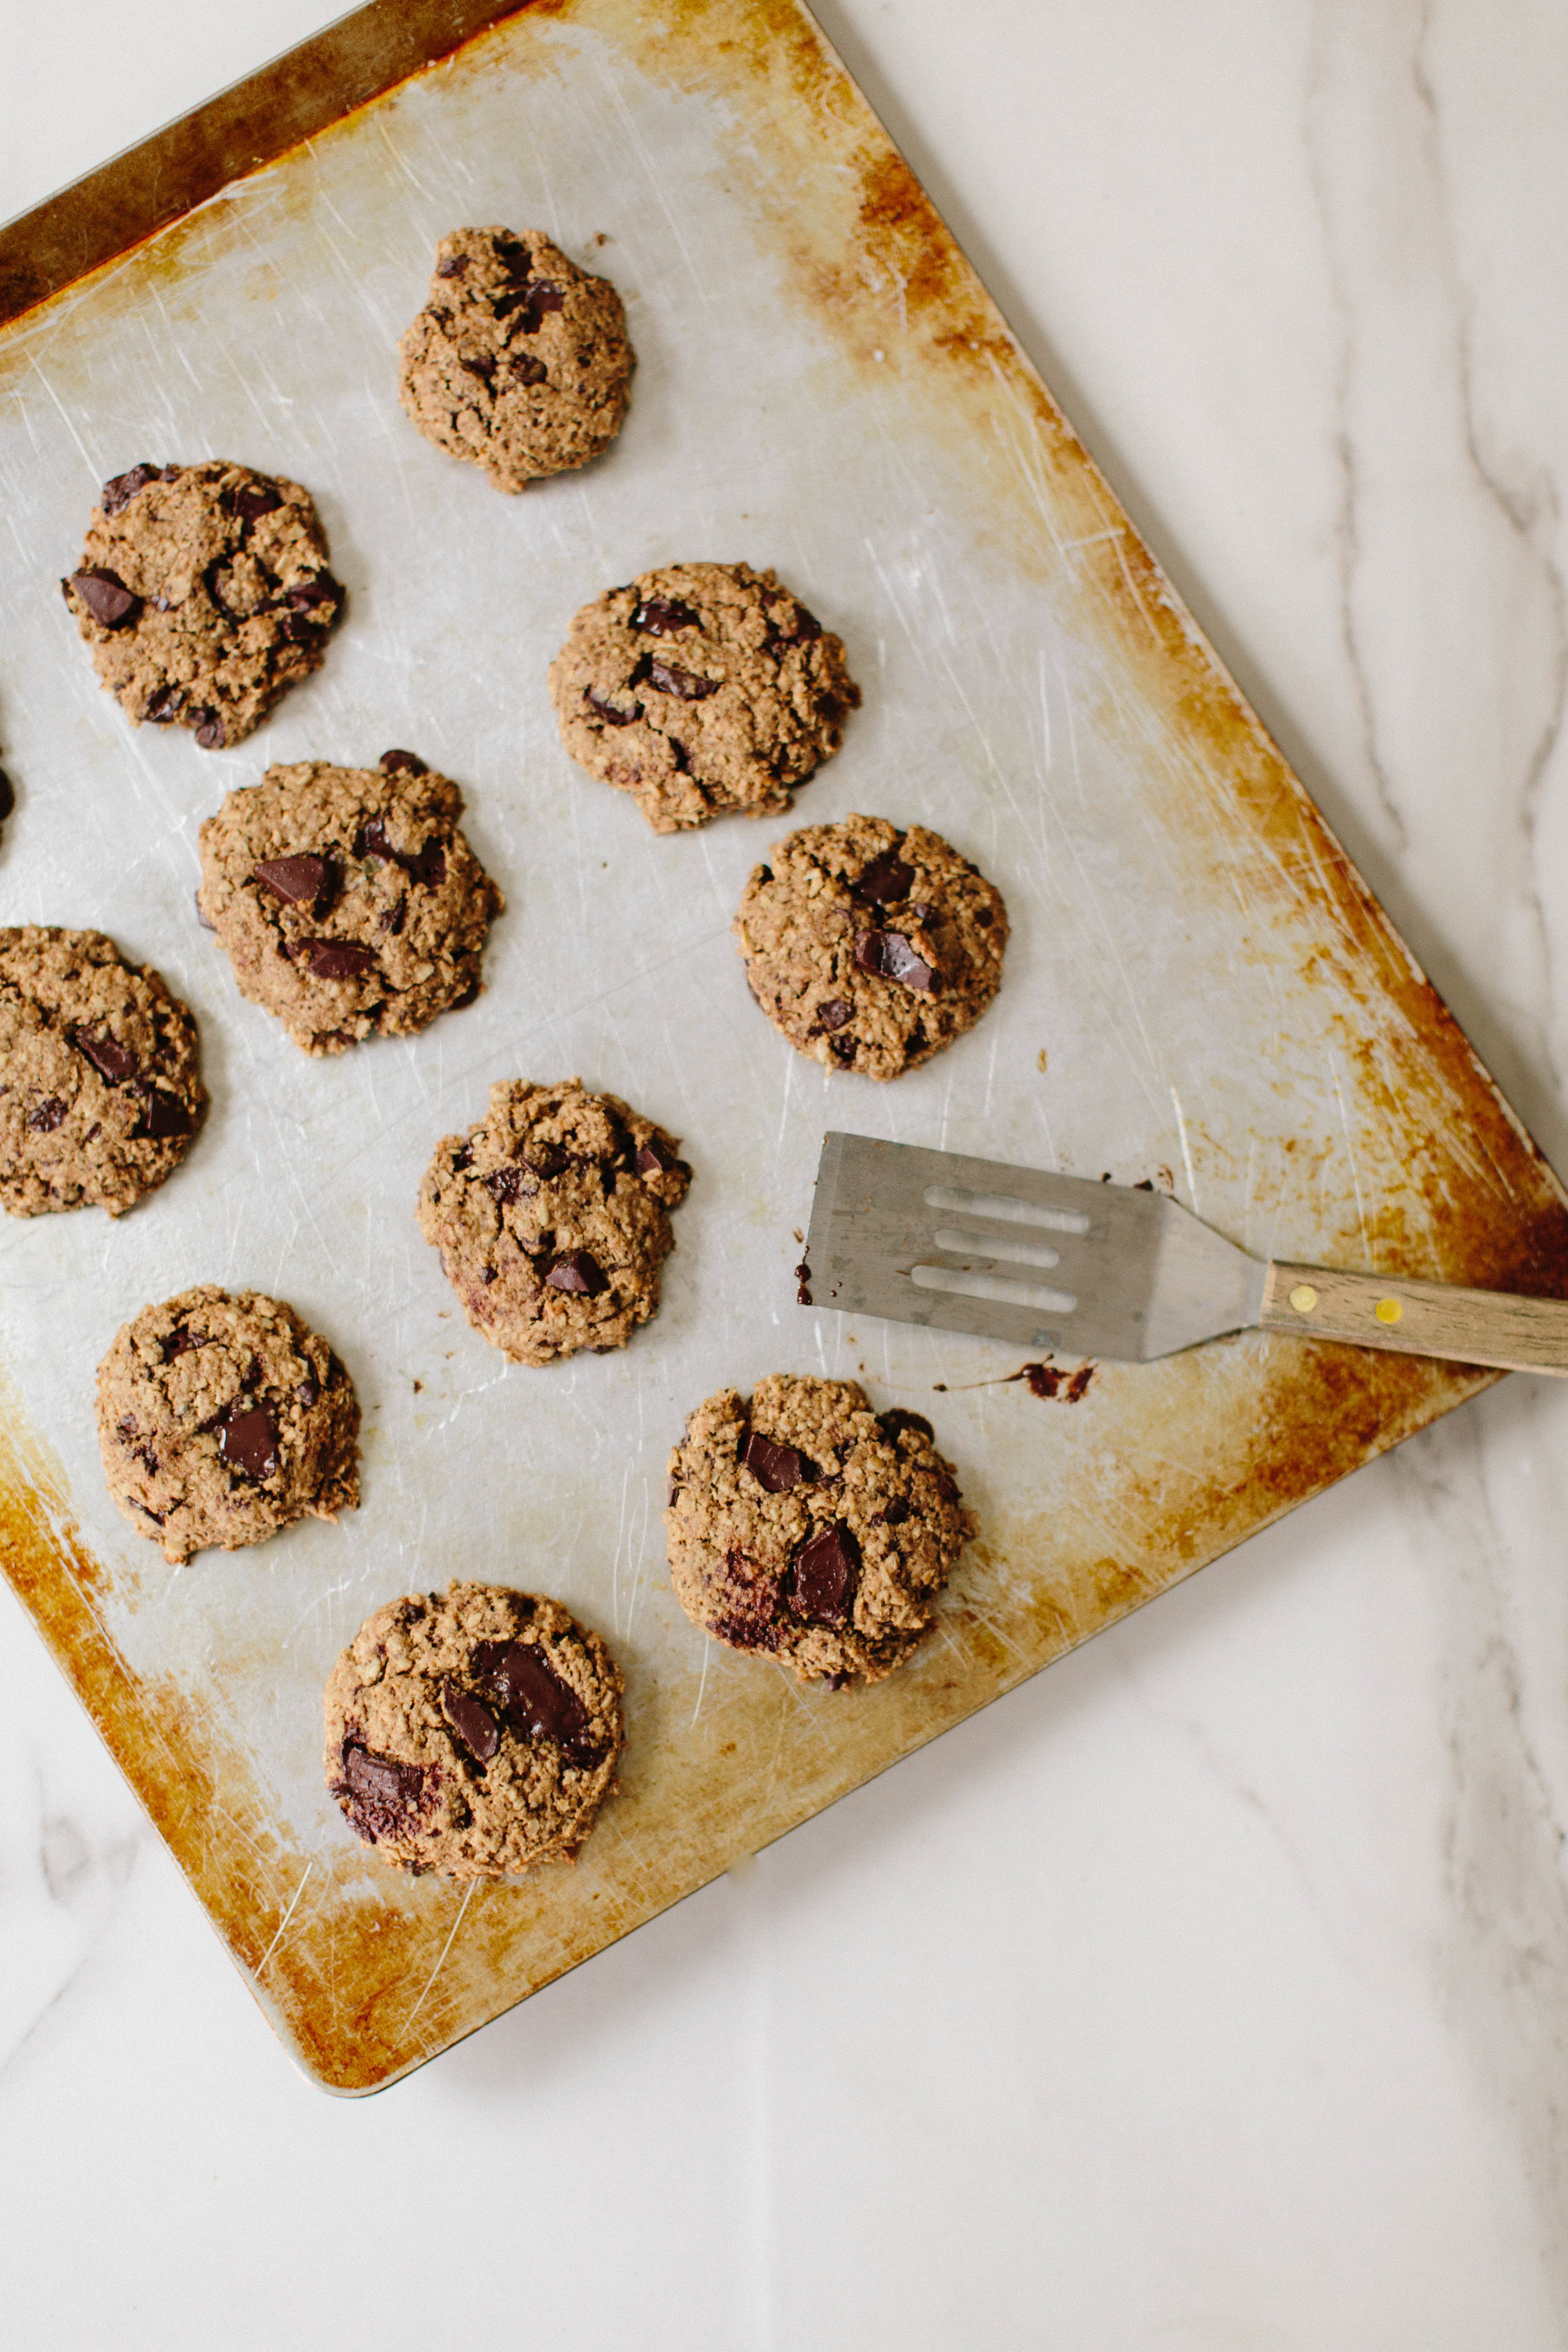 jennahazelphotography-oatmeal-ginger-chocoalte-chip-cookies-6724.jpg